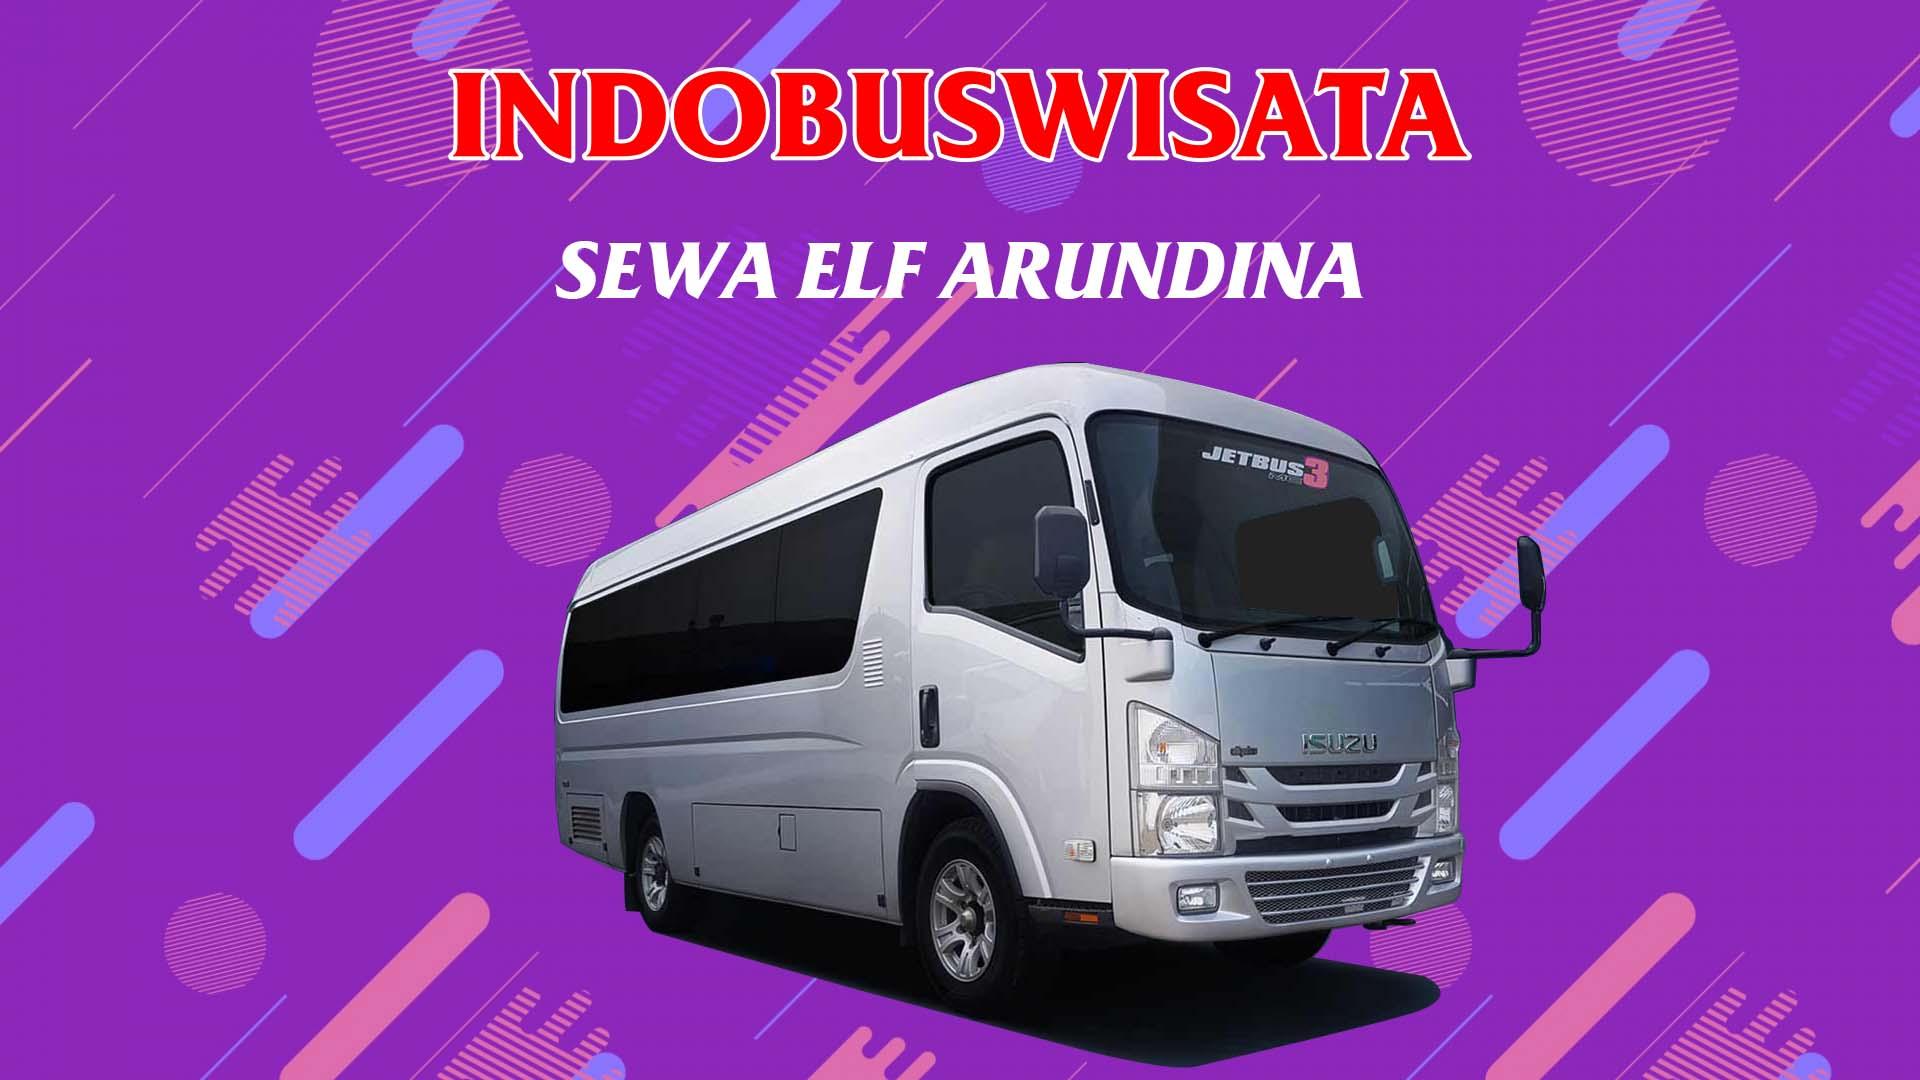 004 Sewa Elf Arundina - Indobuswisata